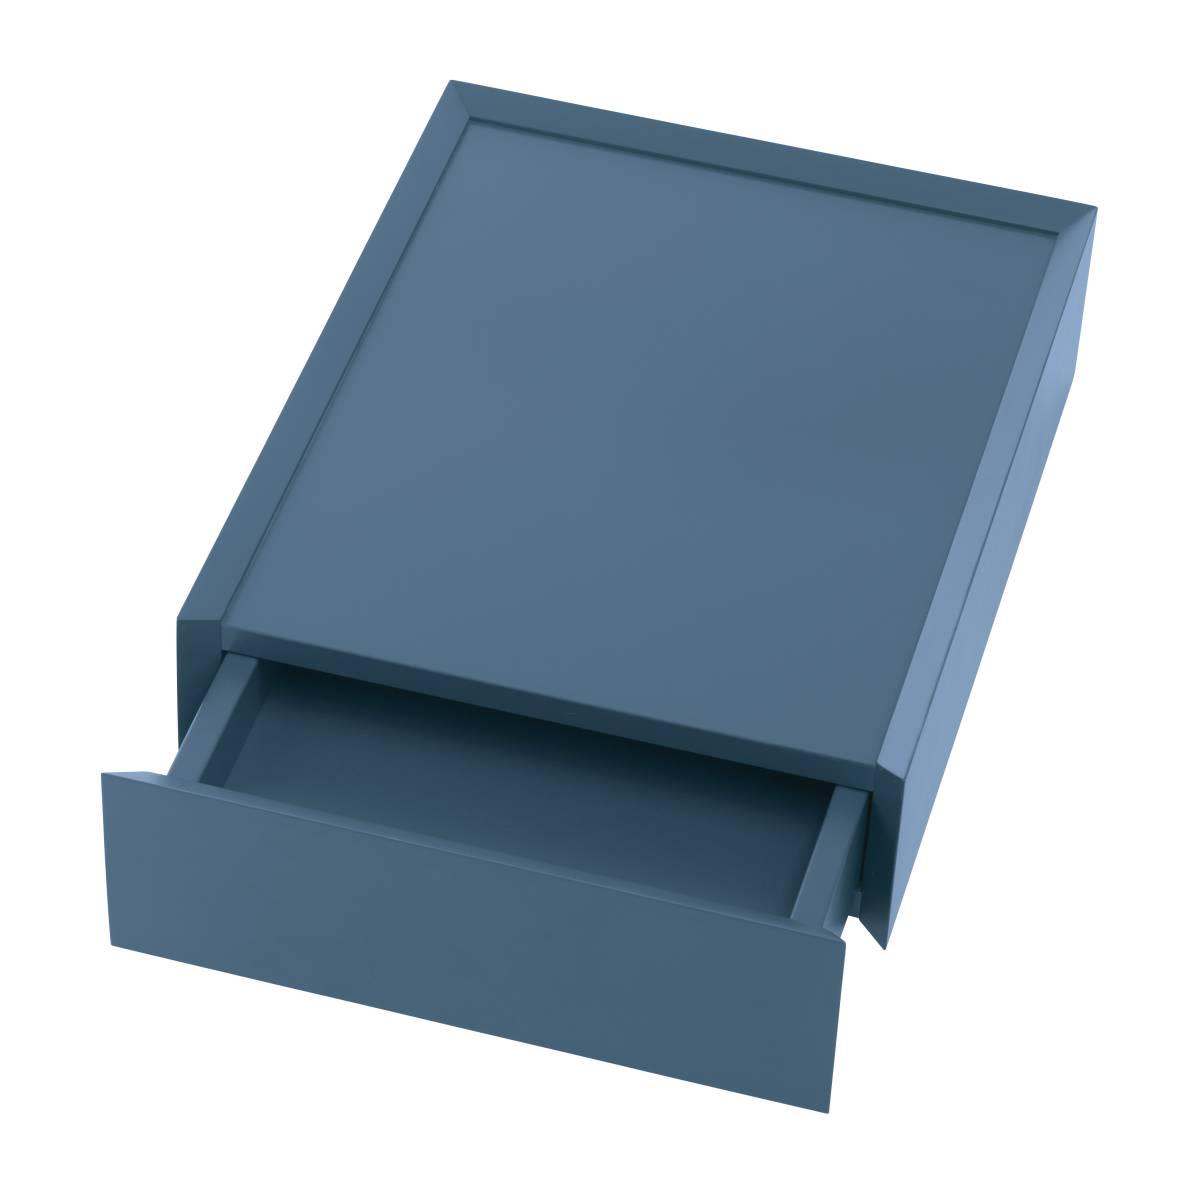 SOUVENIR Schubkastenbox 27 cm stahlblau (68)